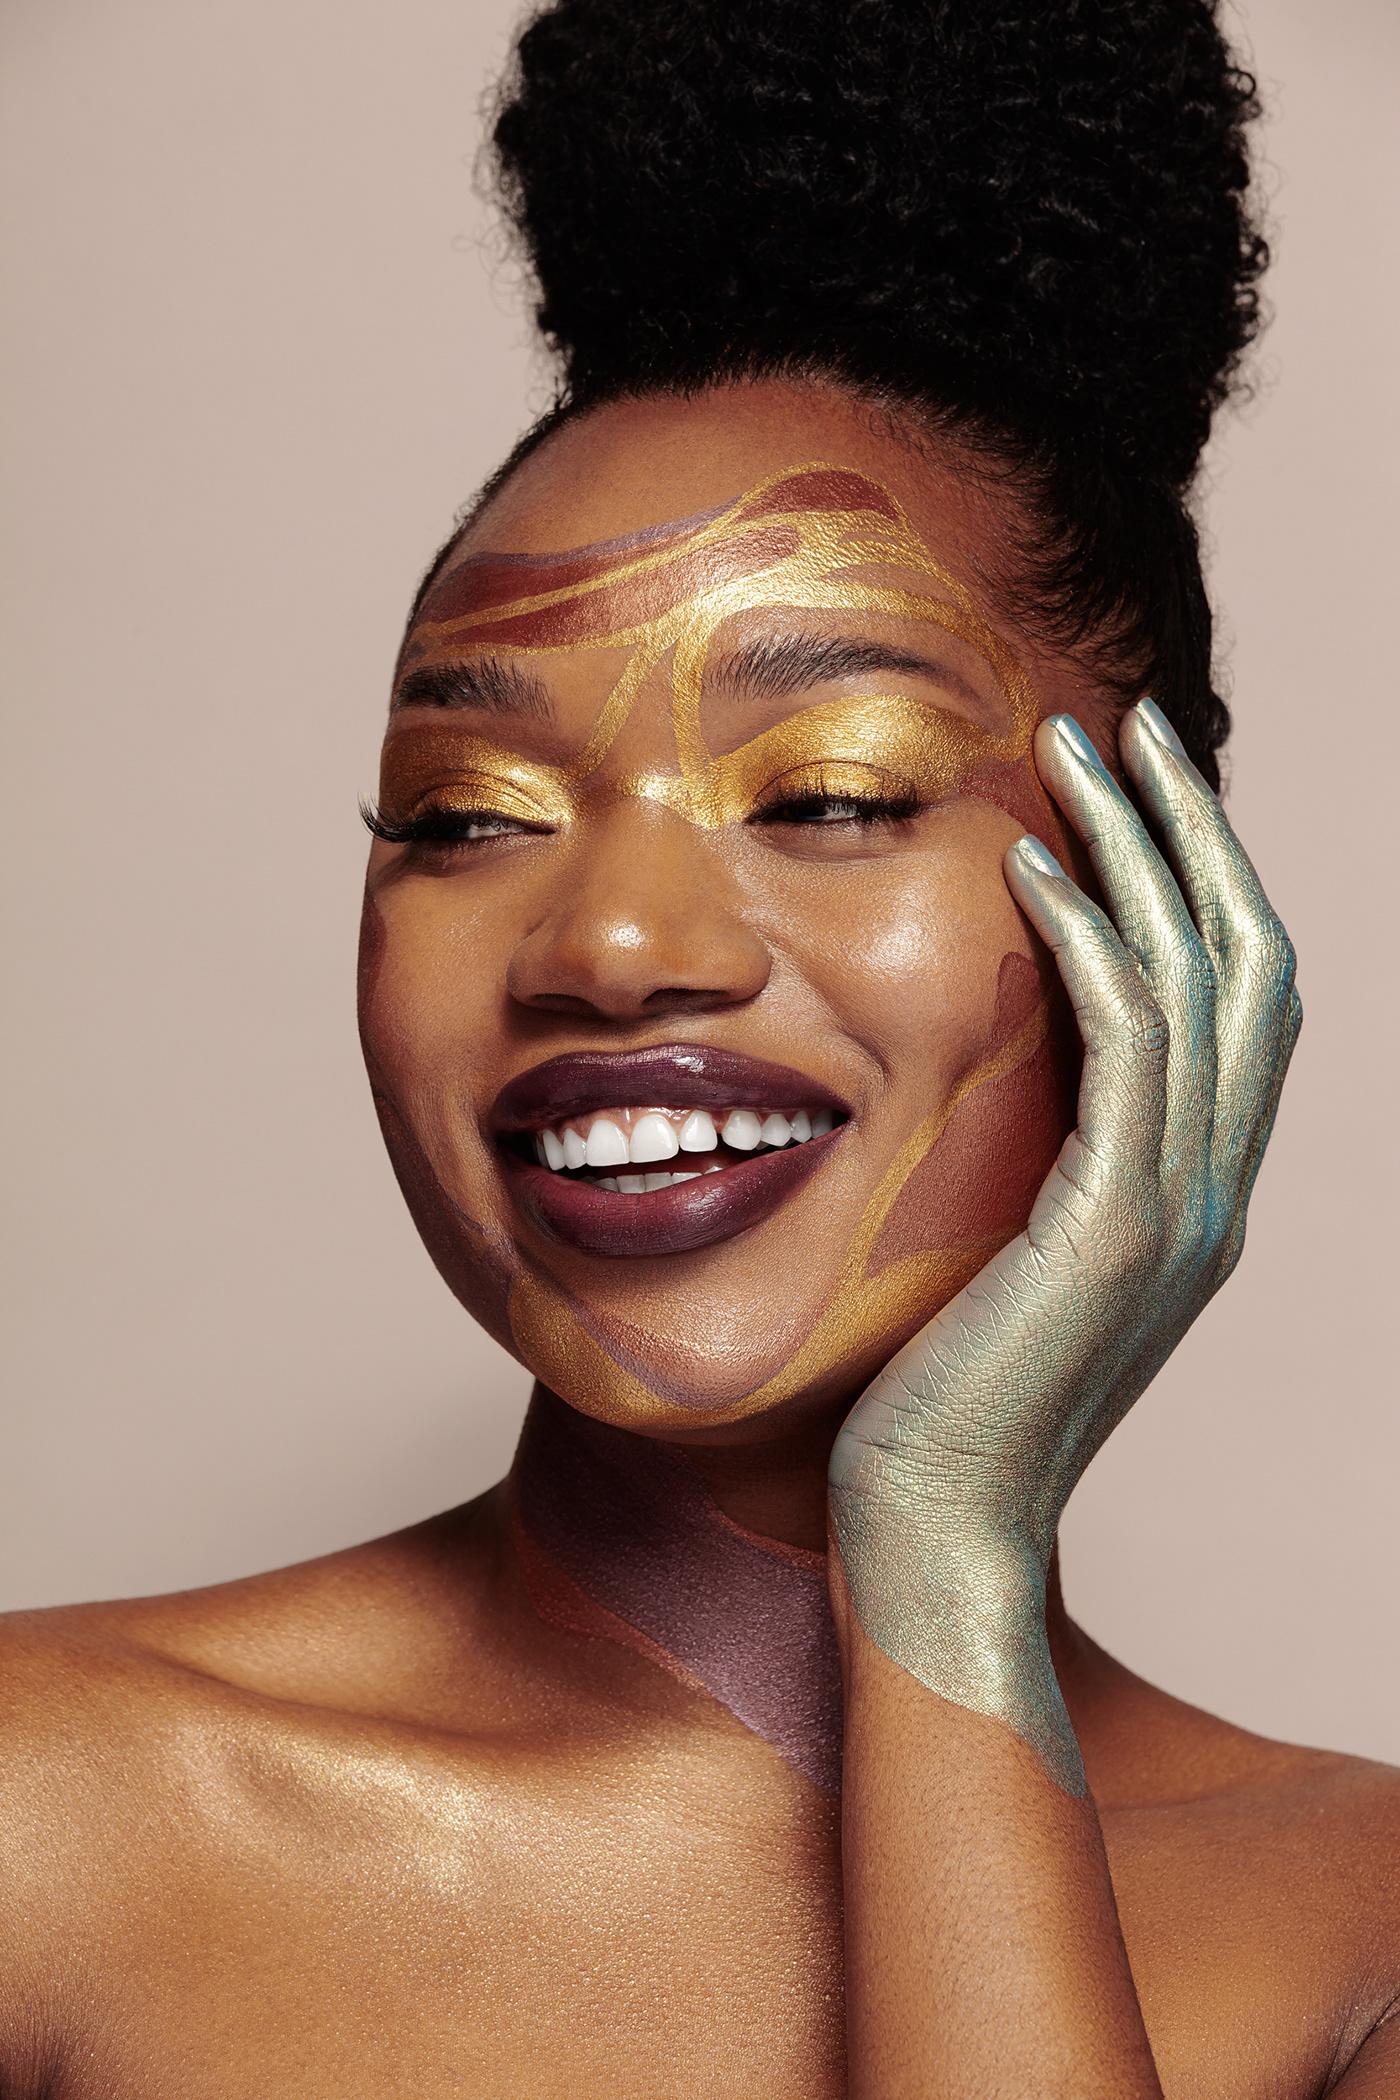 beauty beauty photography beauty retouch editorial Fashion  makeup maquillaje model Photography  portrait